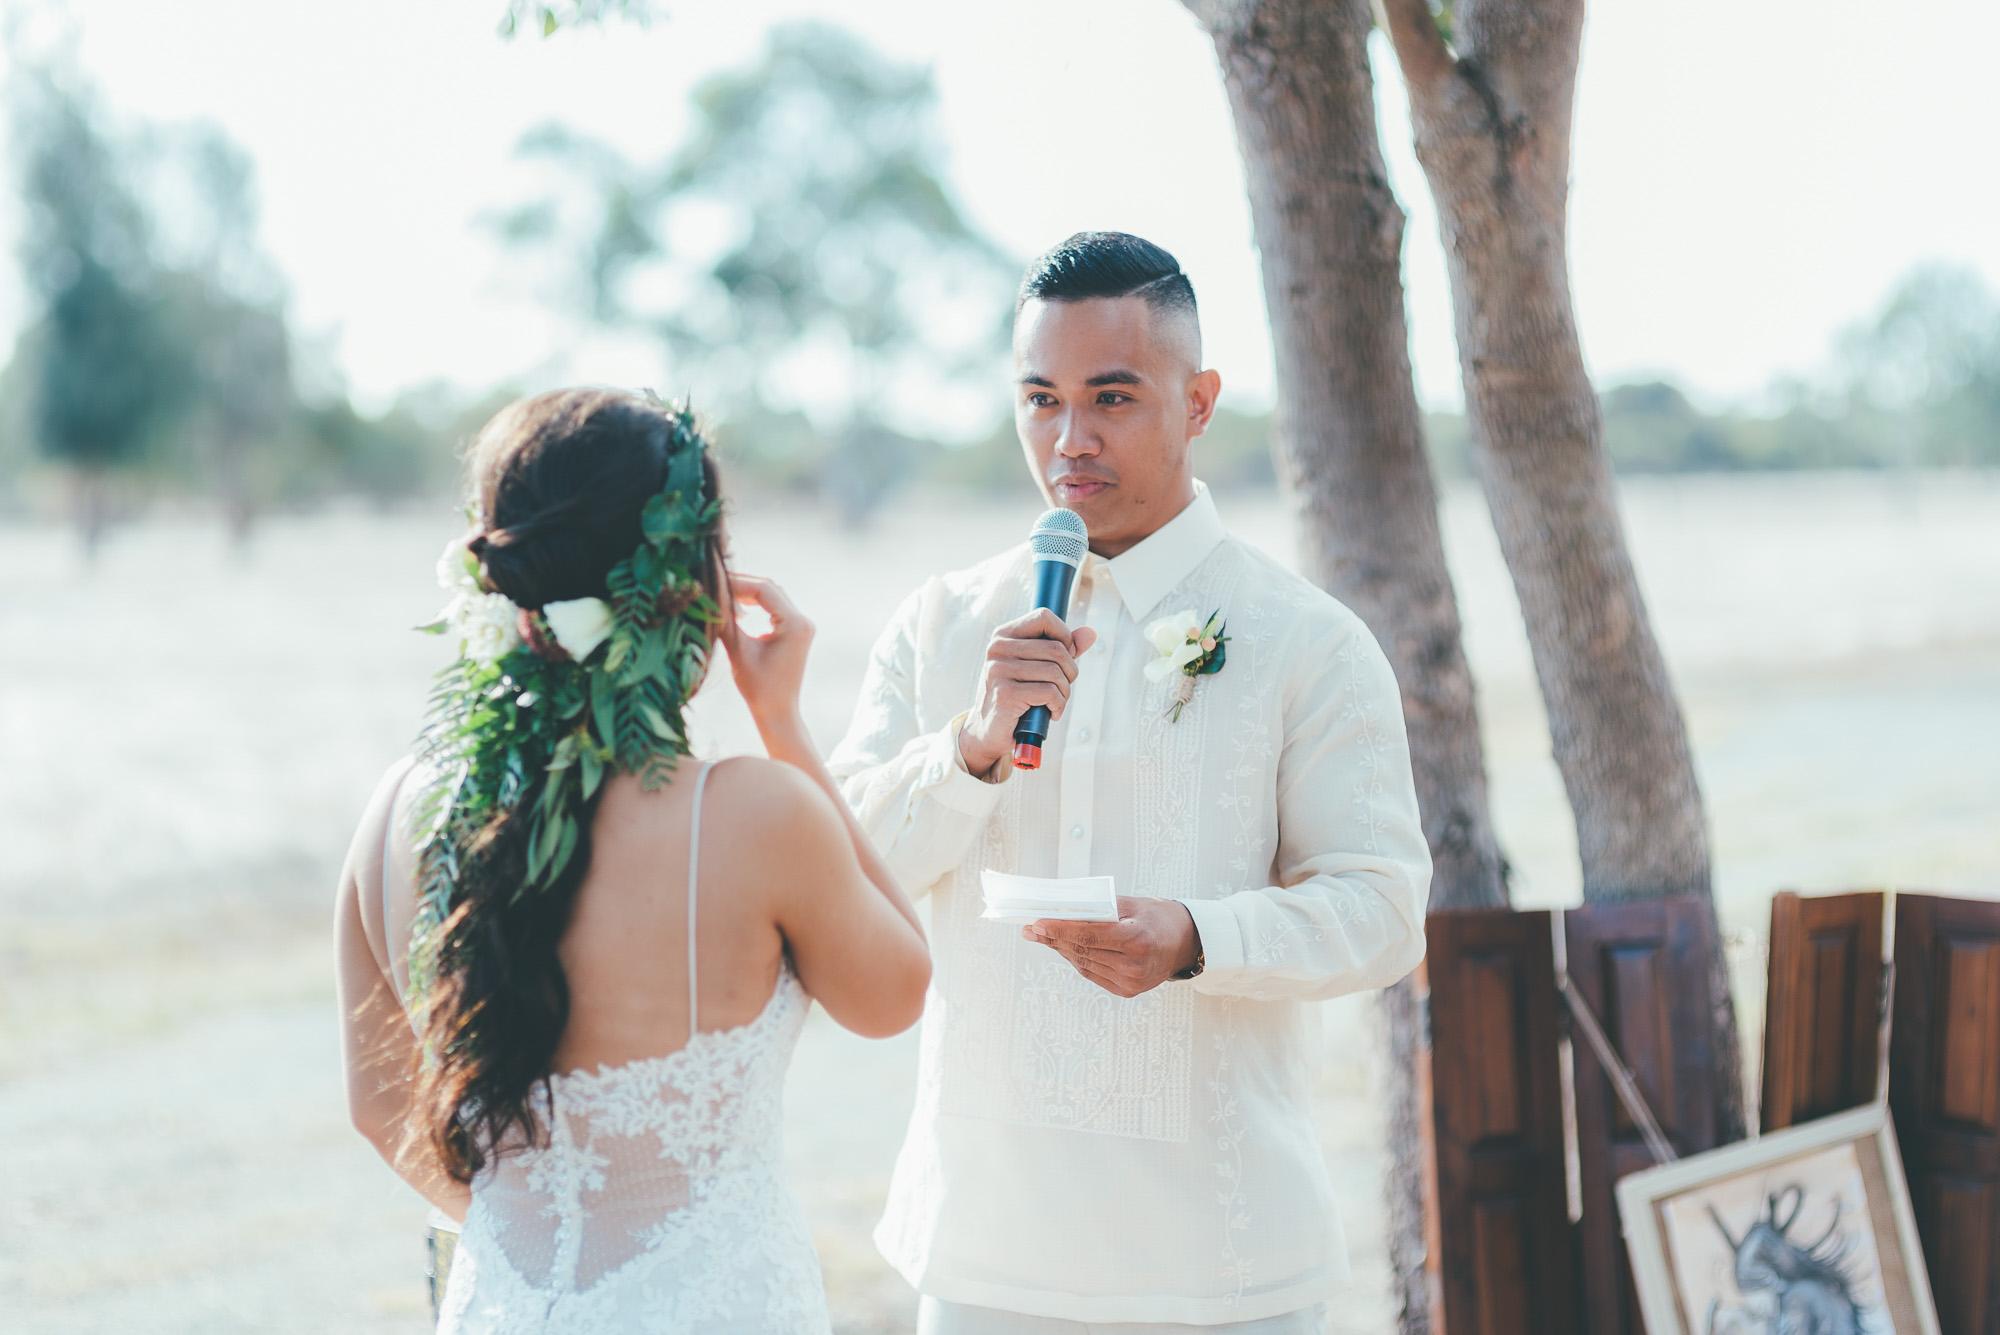 wedding-photographer-outdoor-casual-styled-los-angeles-australia-california-international-earthbound -40.jpg